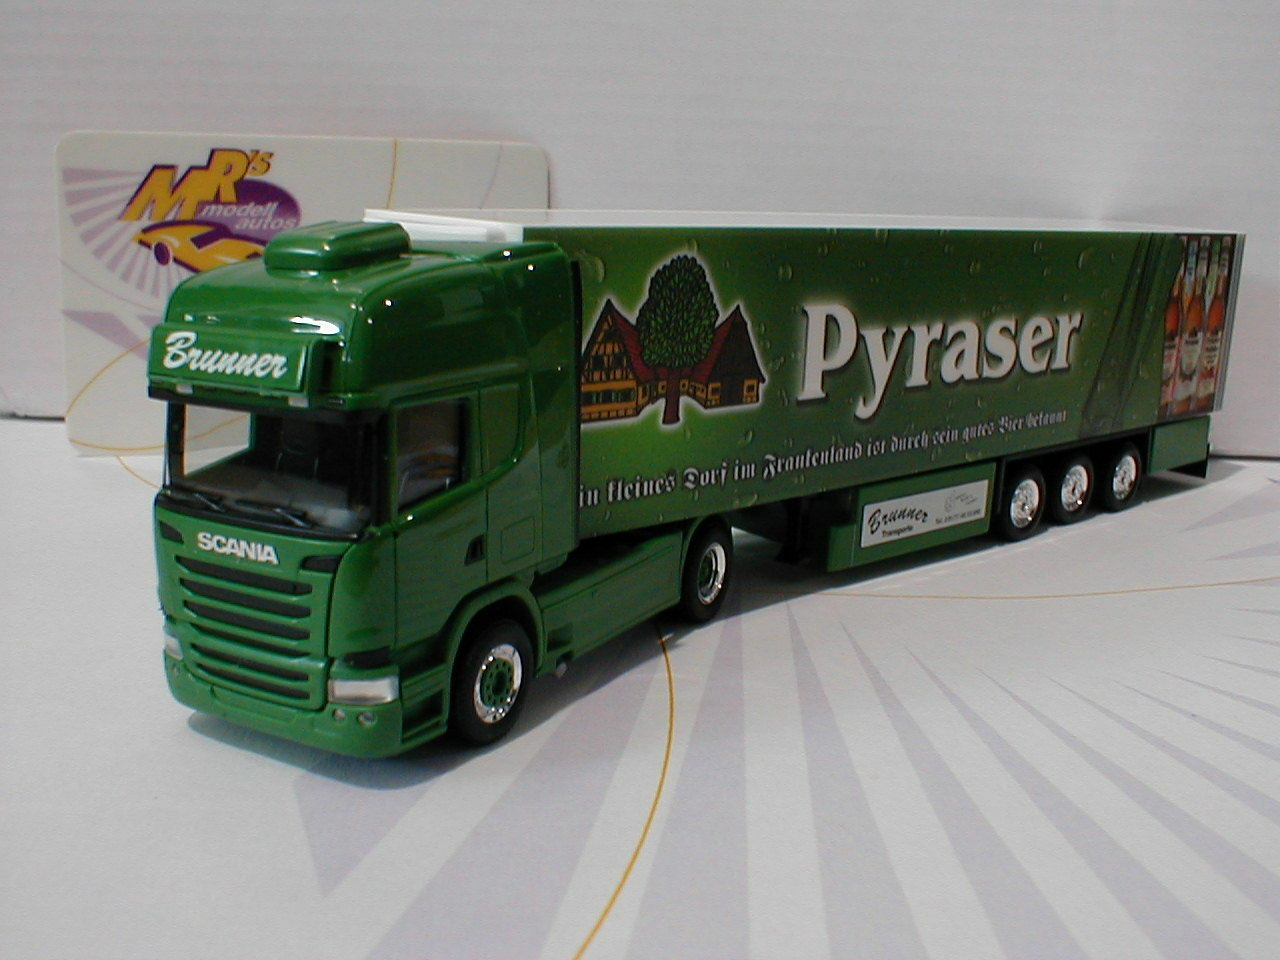 HERPA 306874   scania r tl küko-sz  transporteur Brunner pyraser brasserie  1 87